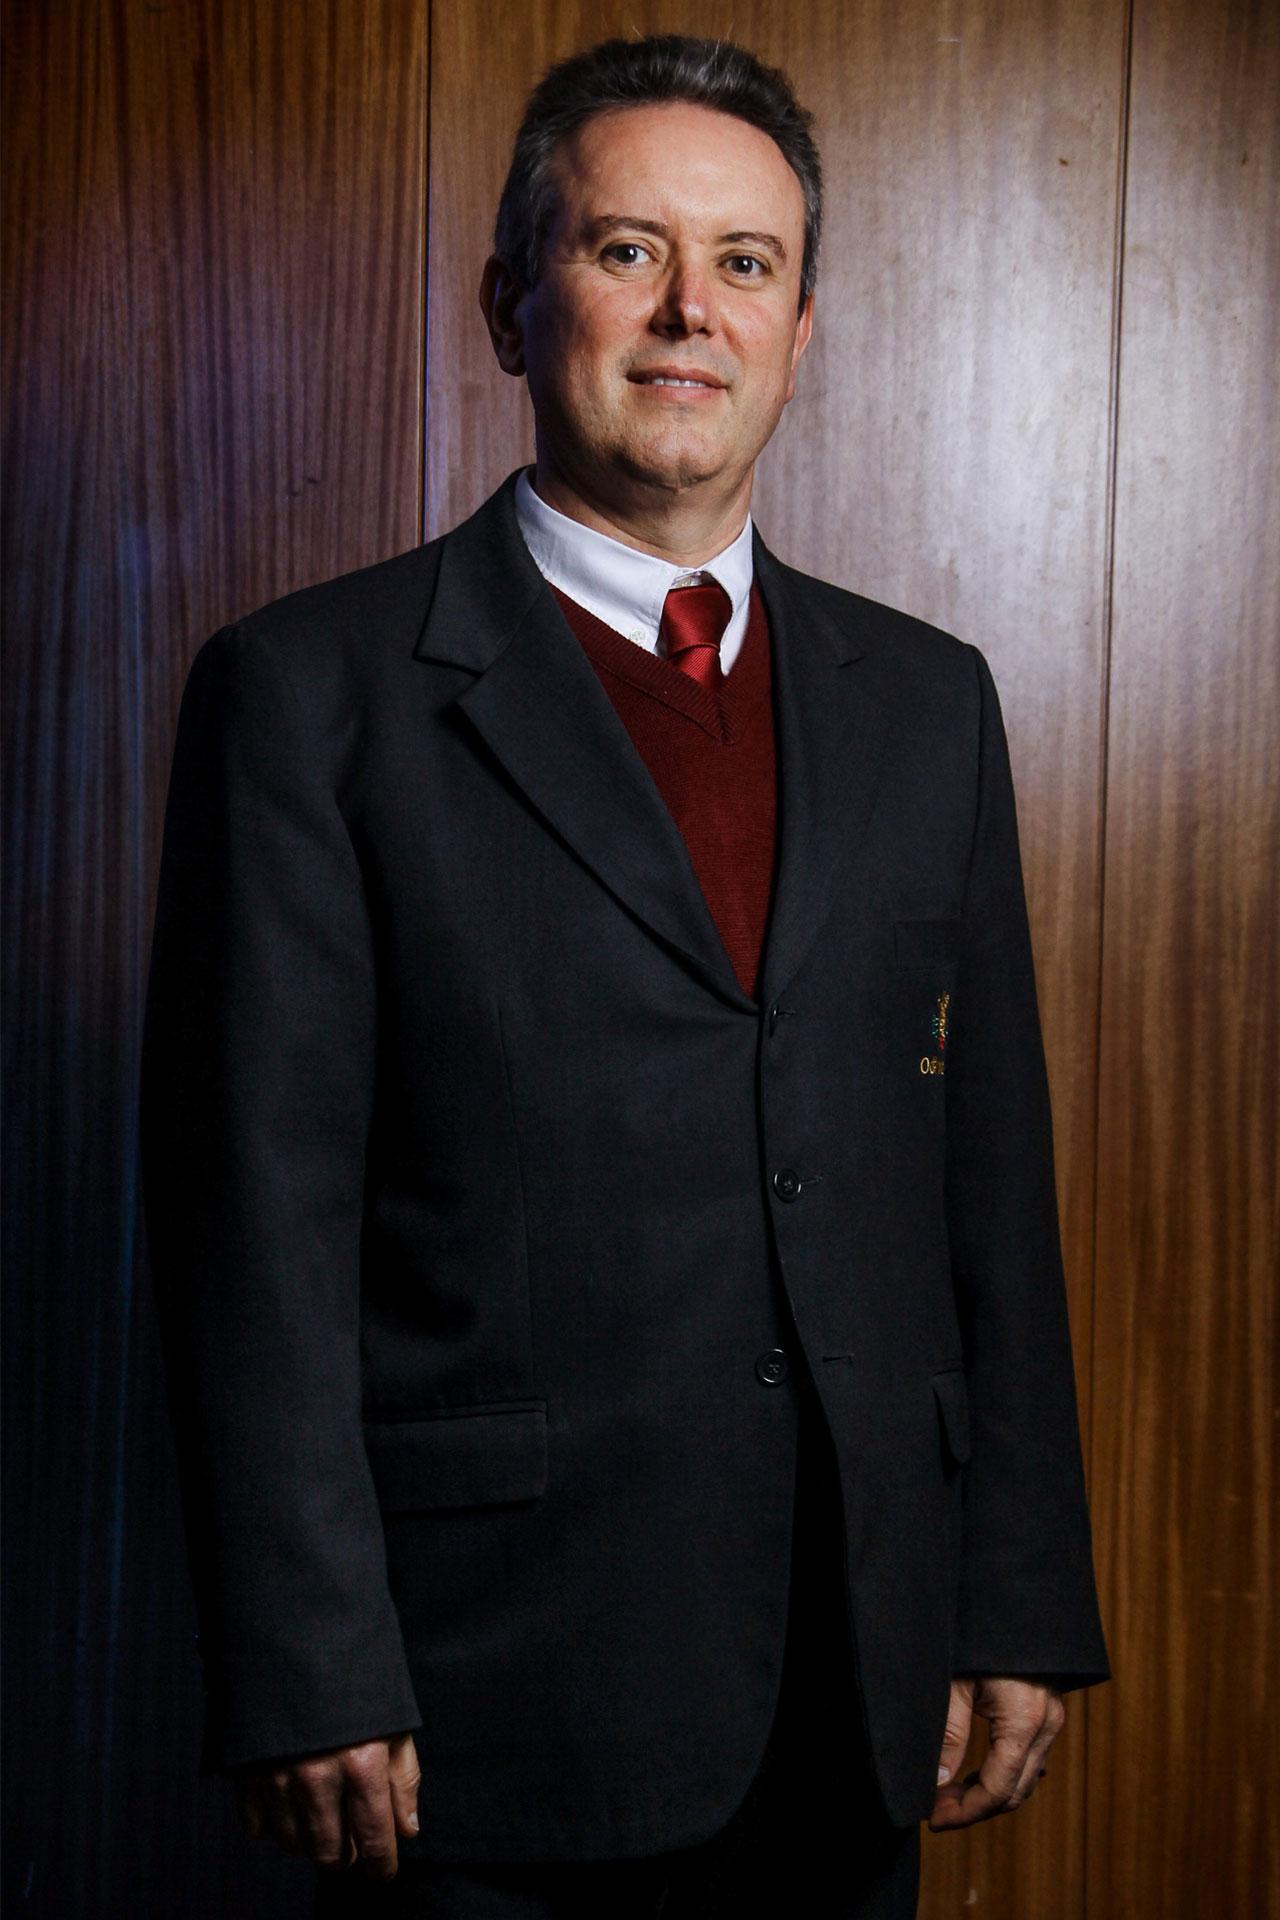 Francisco Ramalhinho Trompete